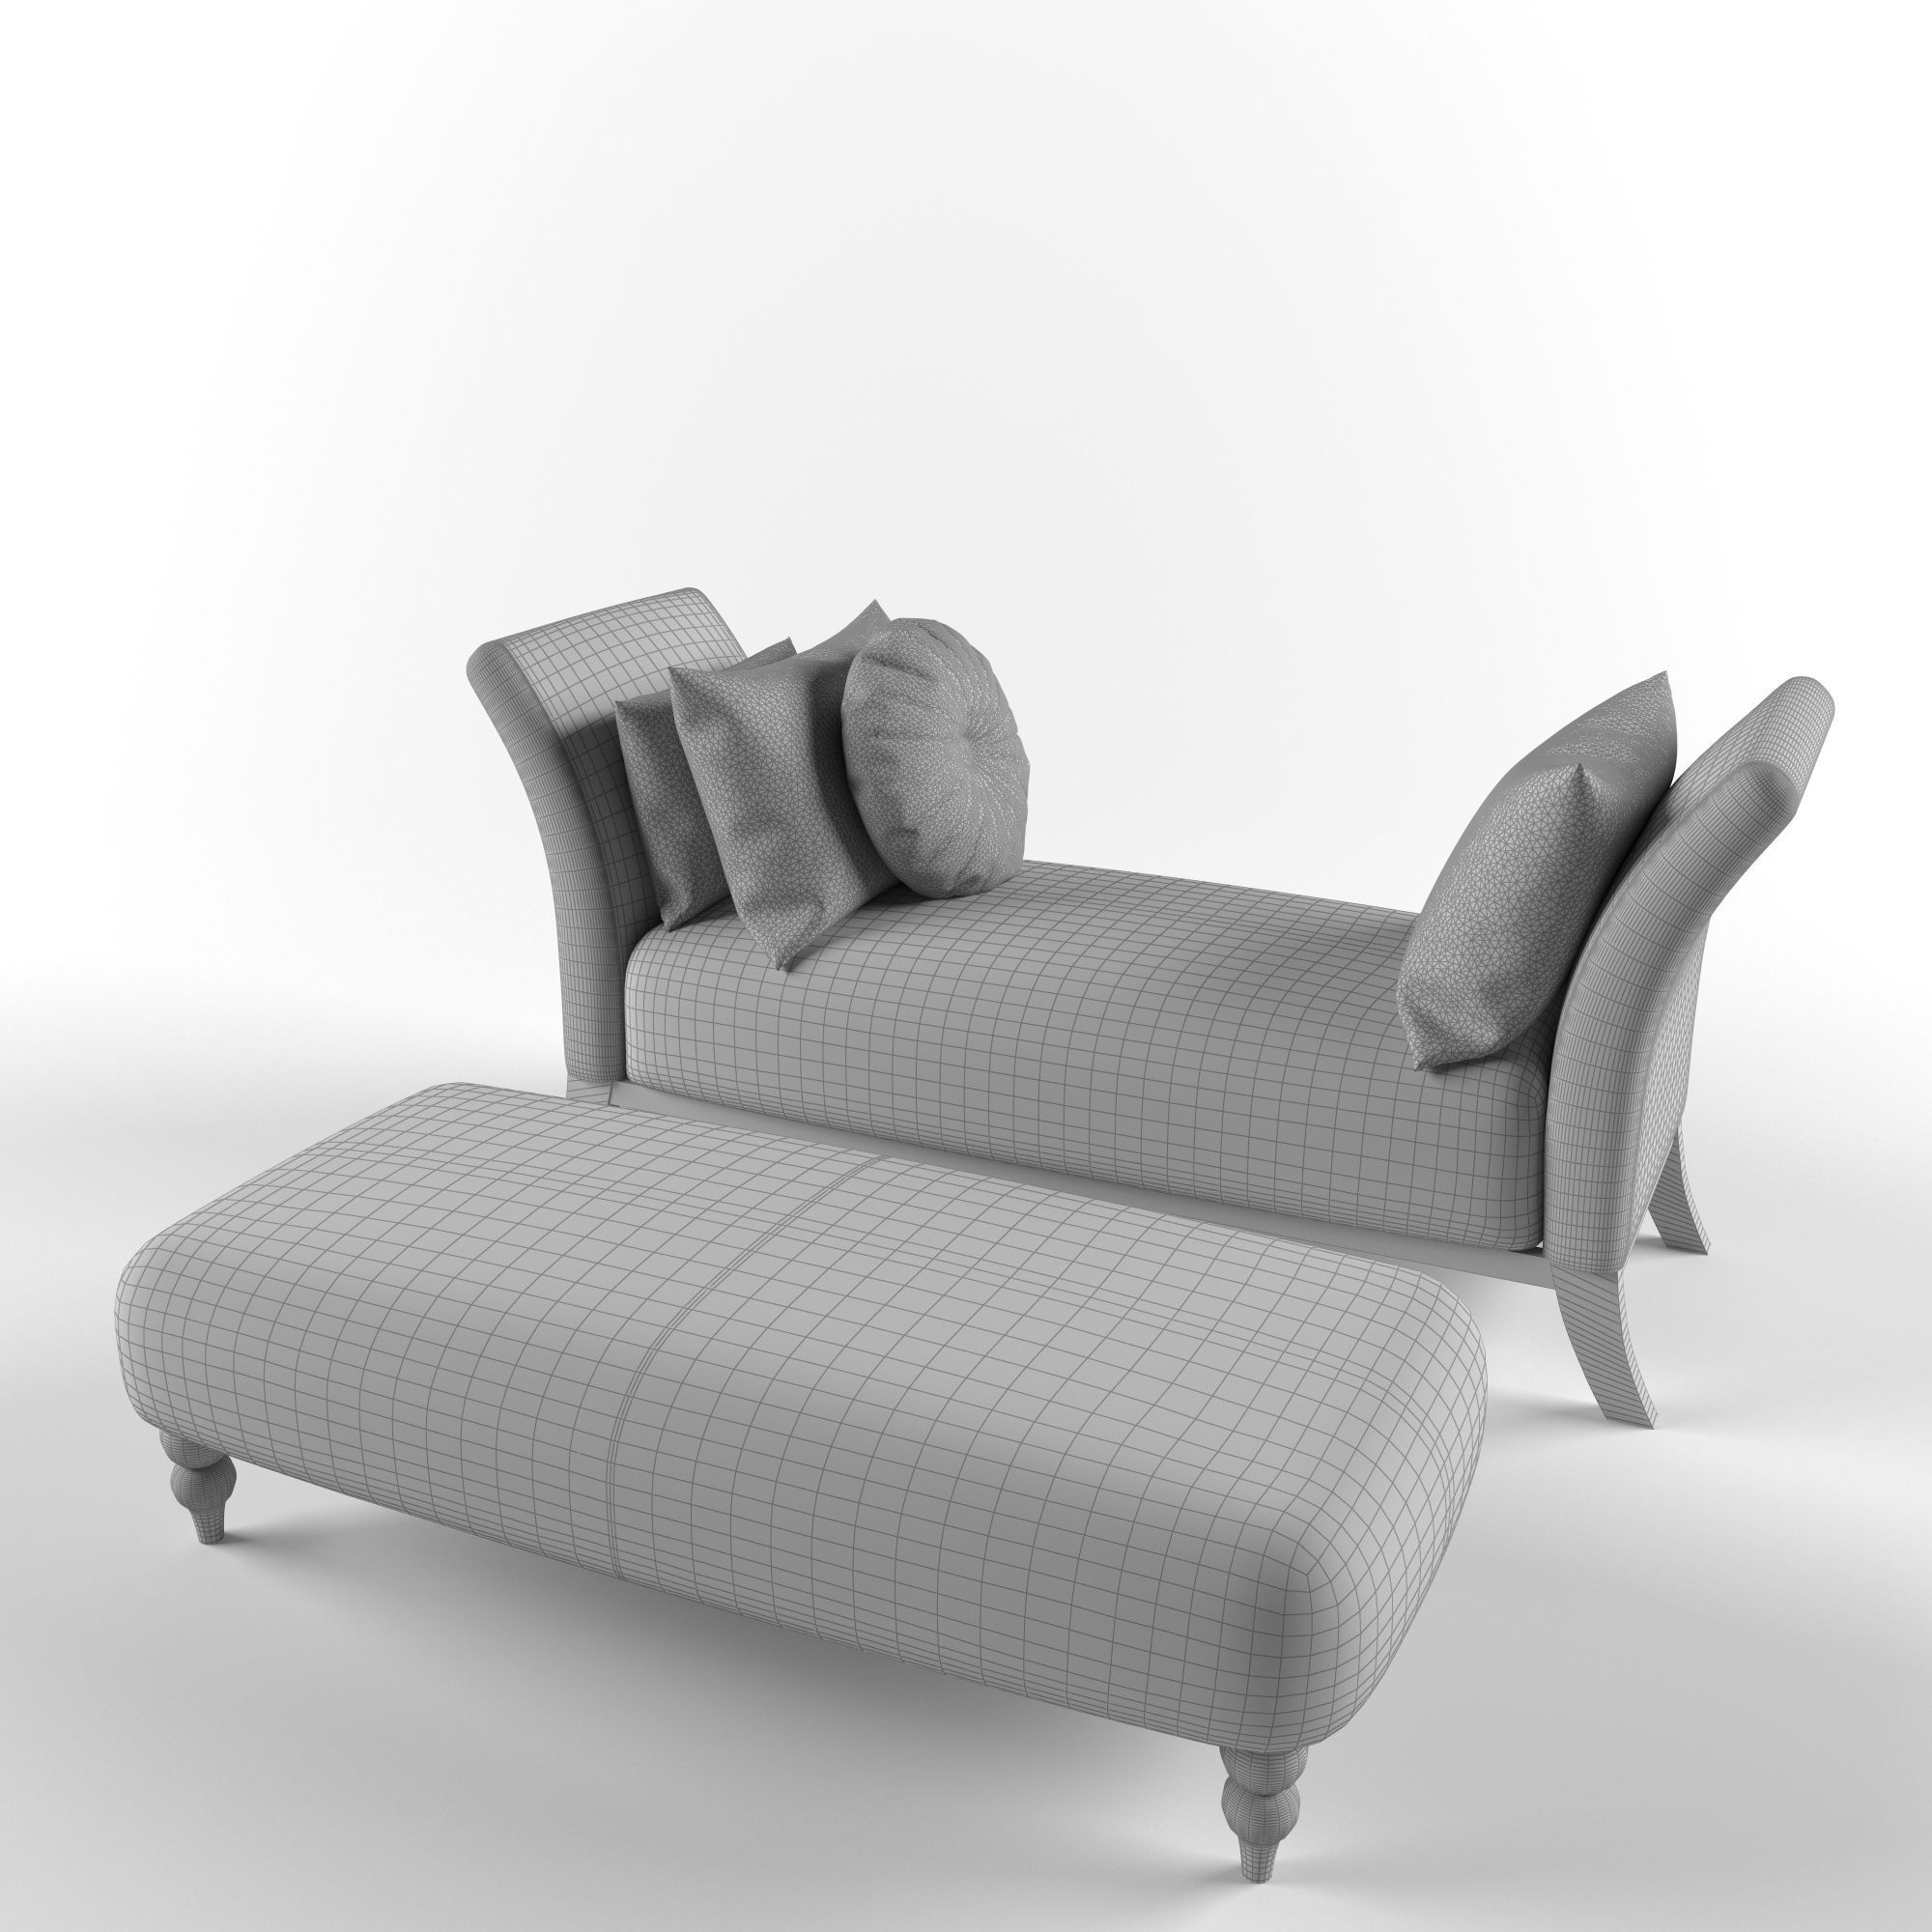 Clic Sofa Banquette Model Max Fbx Unitypackage Prefab 2